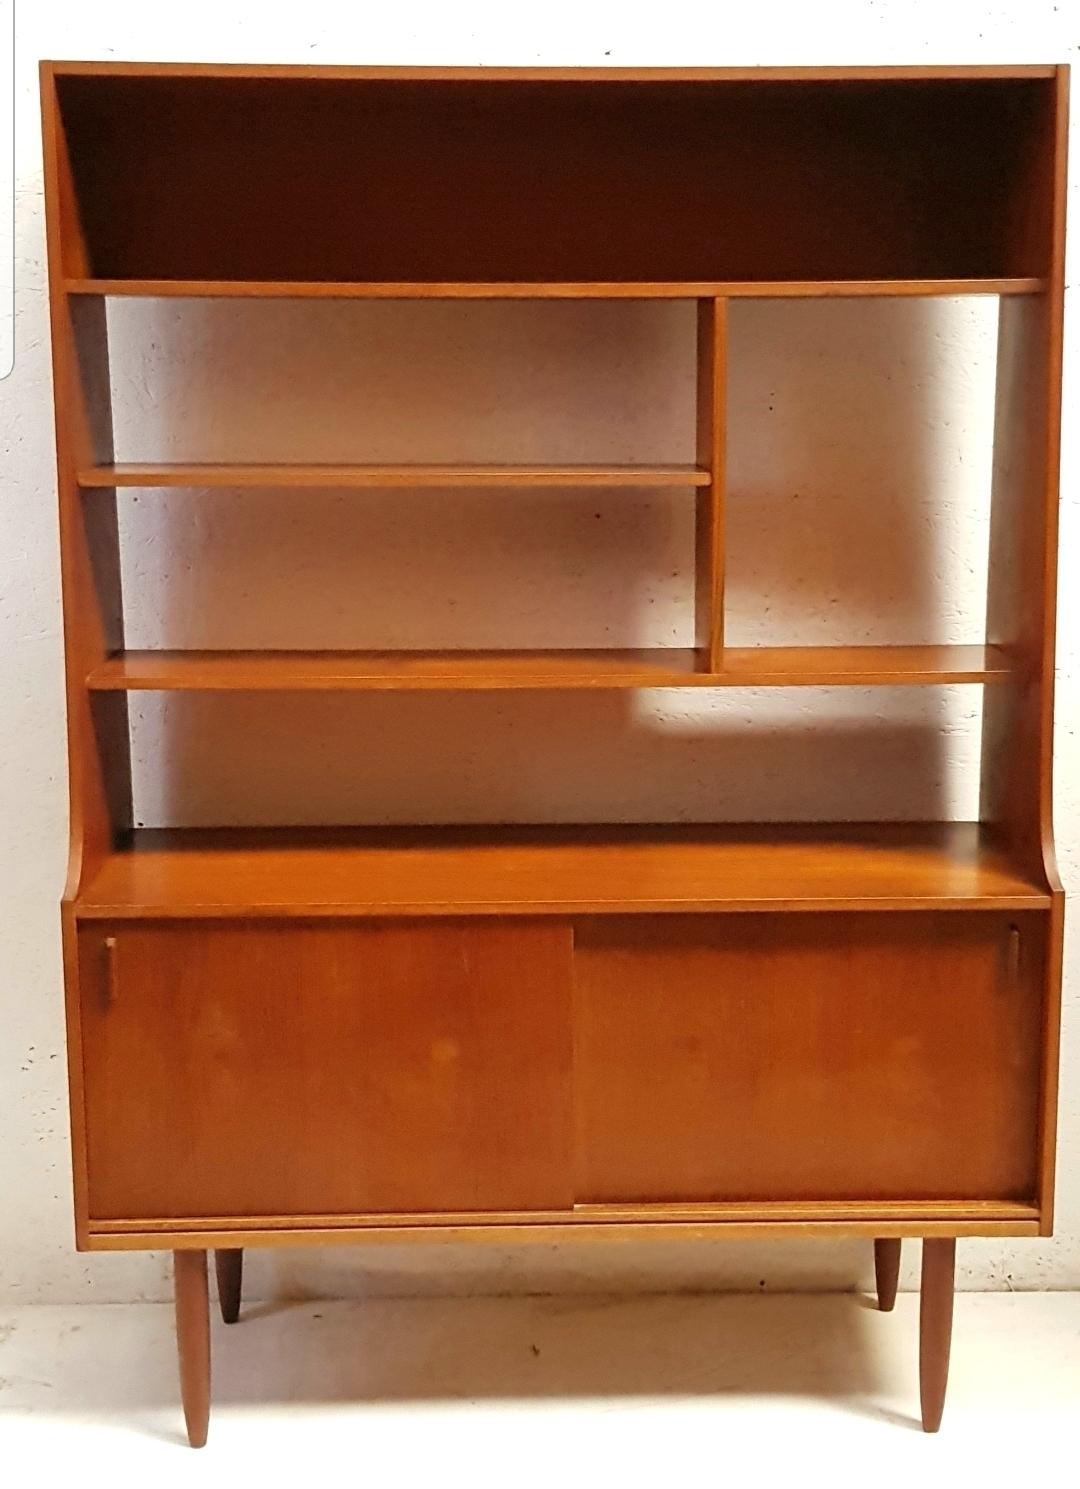 Midcentury Modern Teak Room Divider Retro Bookshelf Display Stand 1960s G Plan Danish Modern